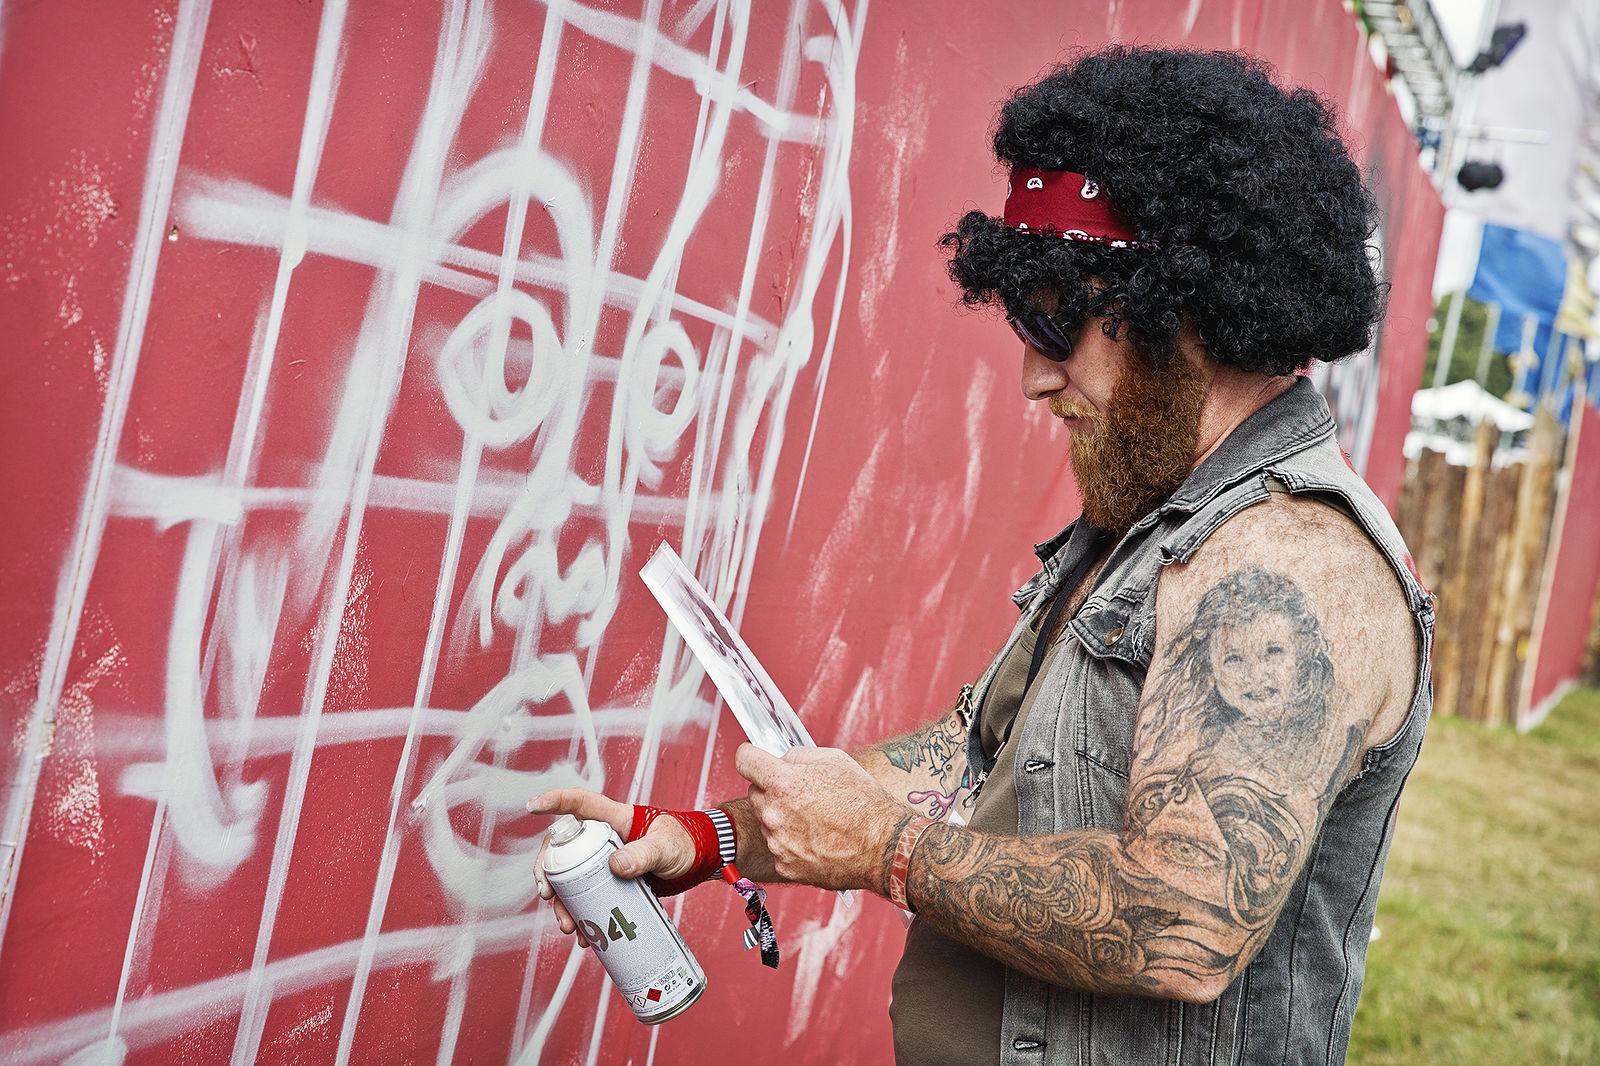 V Festival 2016 - Graffiti Artist - Bianca Barrett